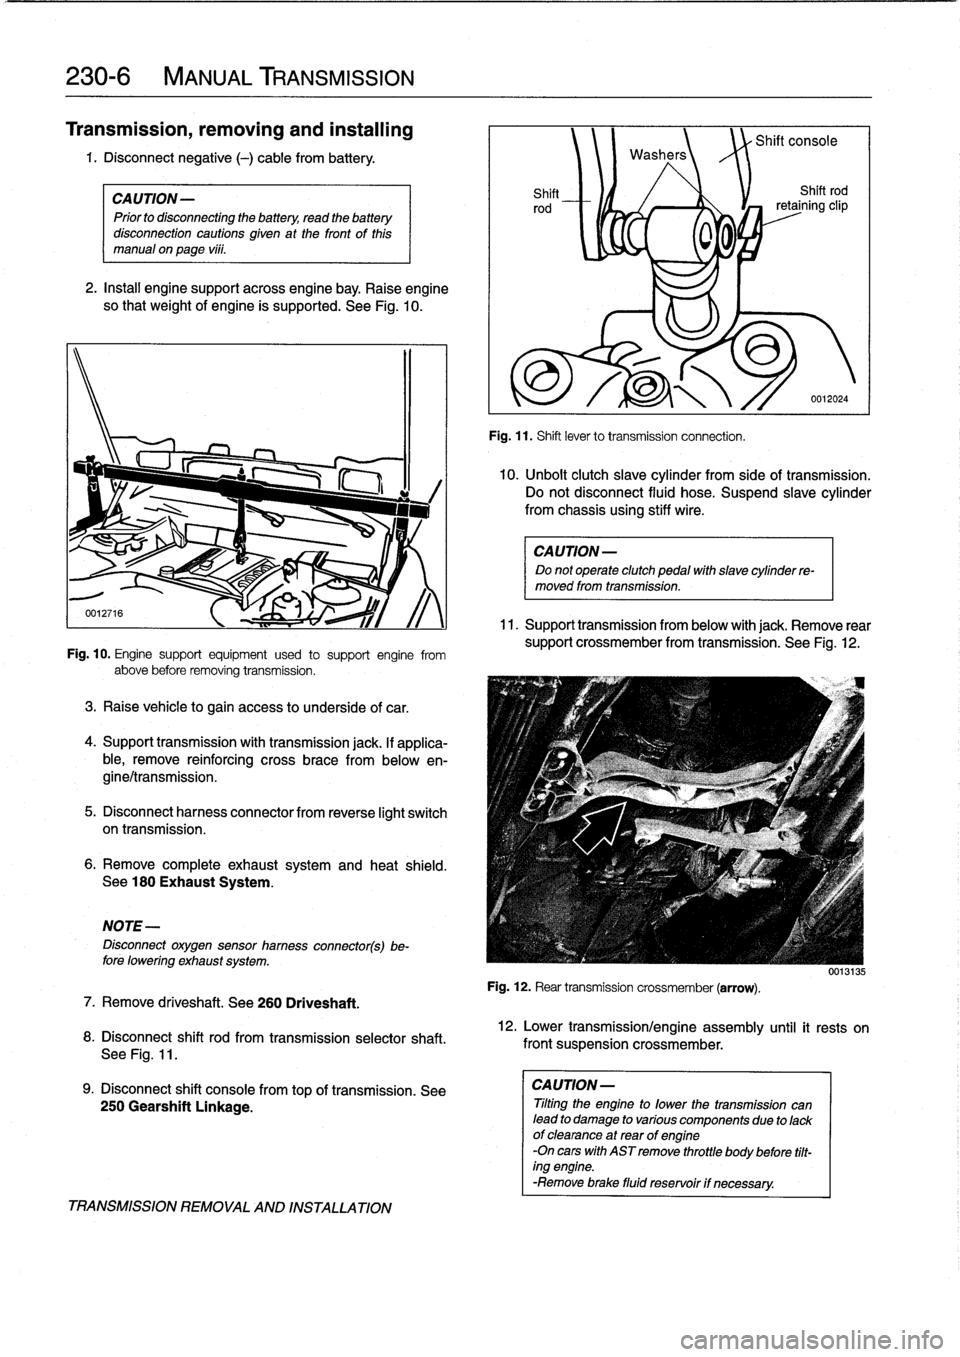 bmw m3 1998 e36 workshop manual